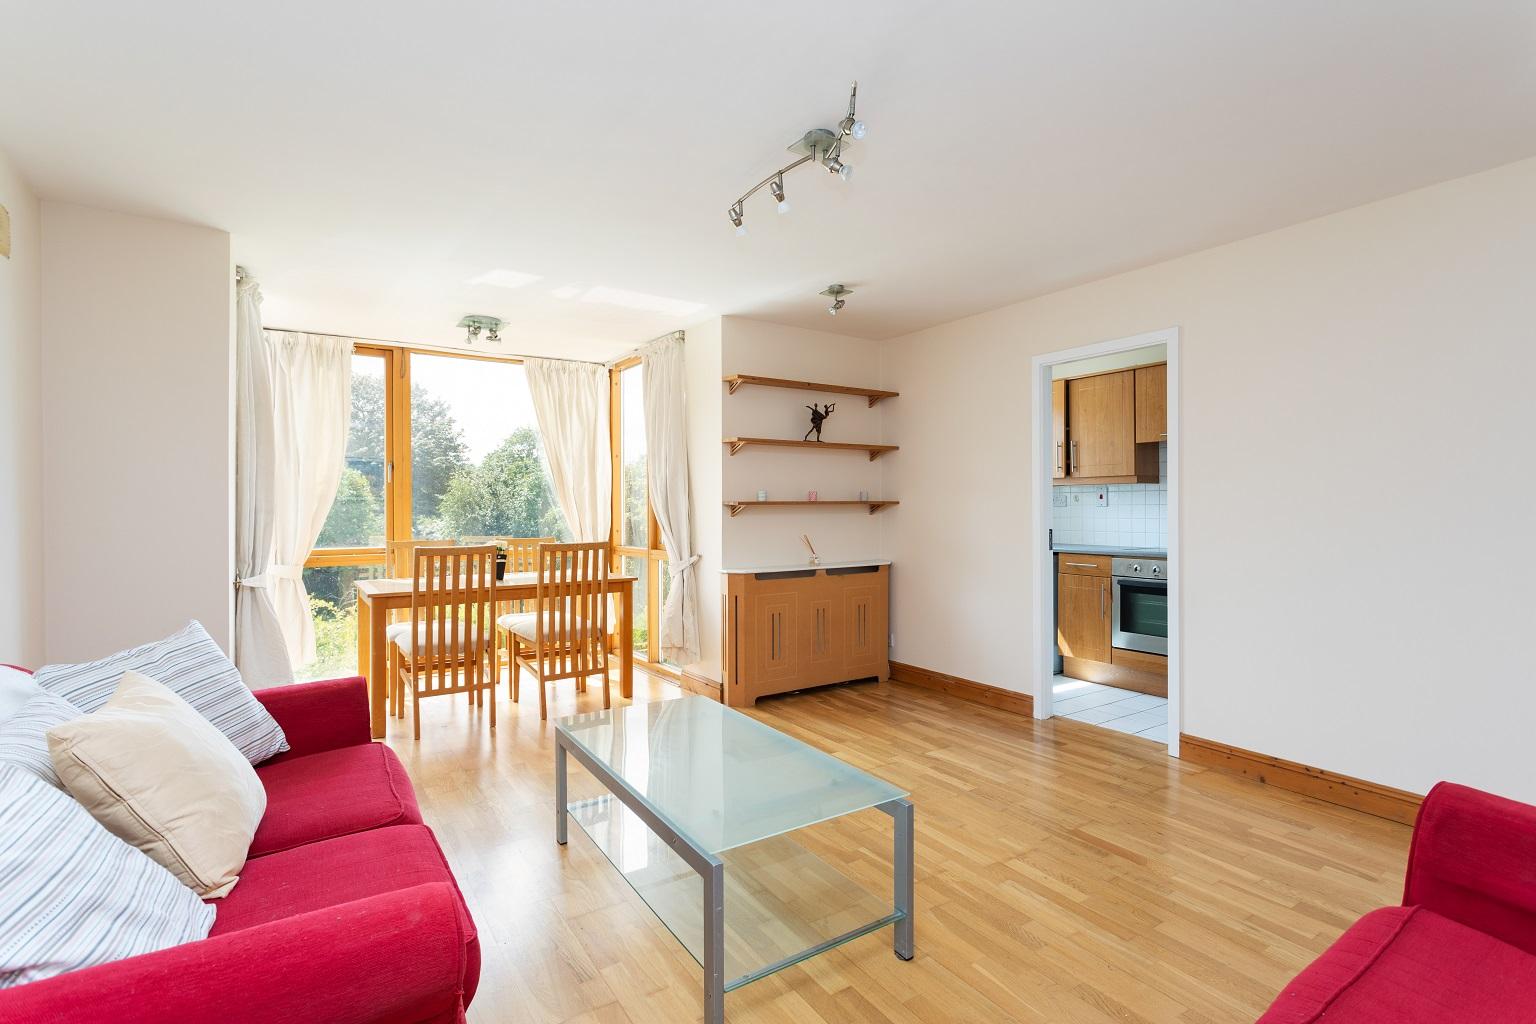 149 Bellevue Apartments, Islandbridge, Dublin 8.